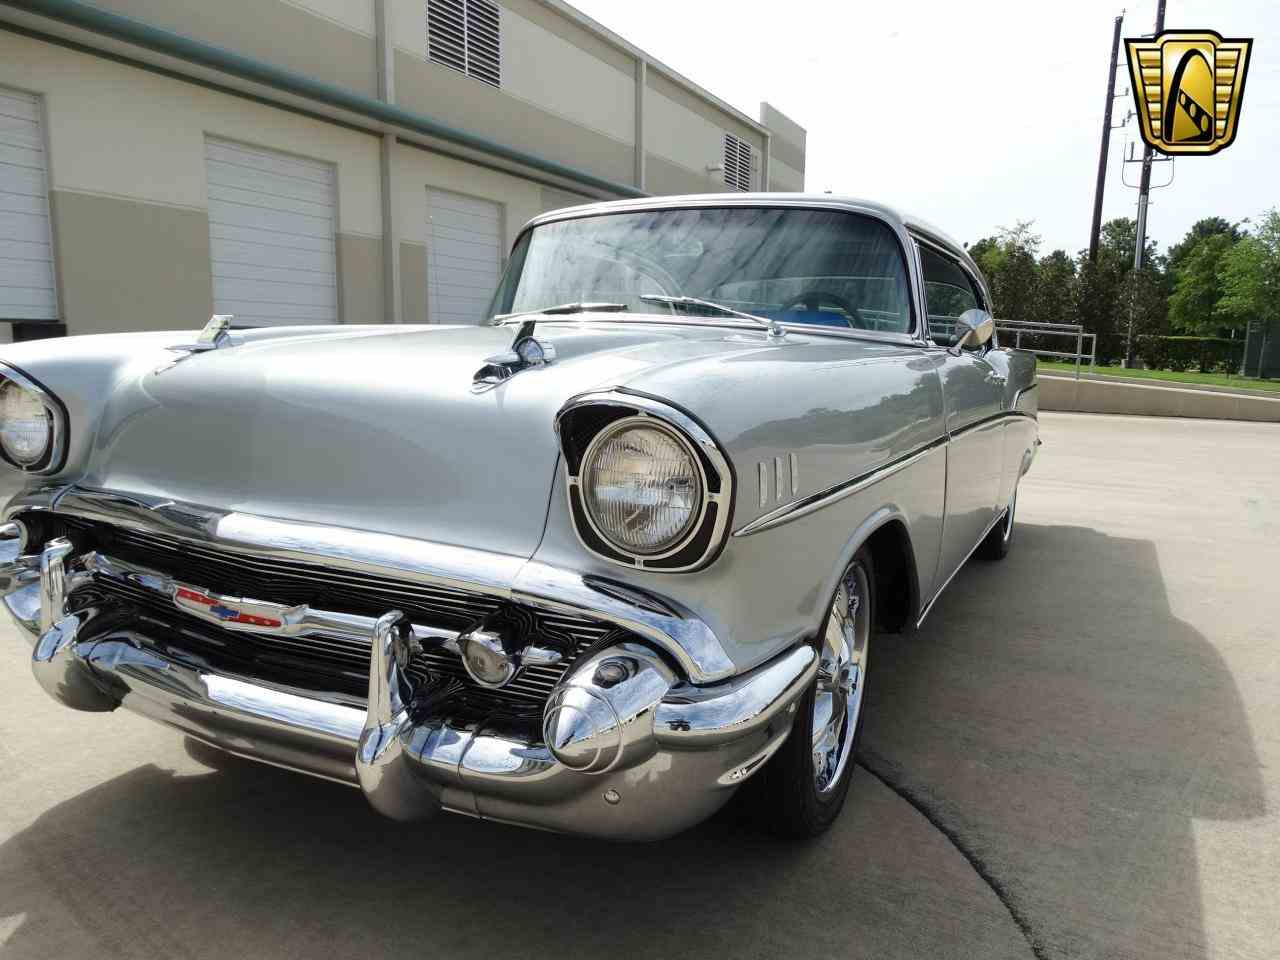 1957 Chevrolet Bel Air for Sale | ClassicCars.com | CC-951936